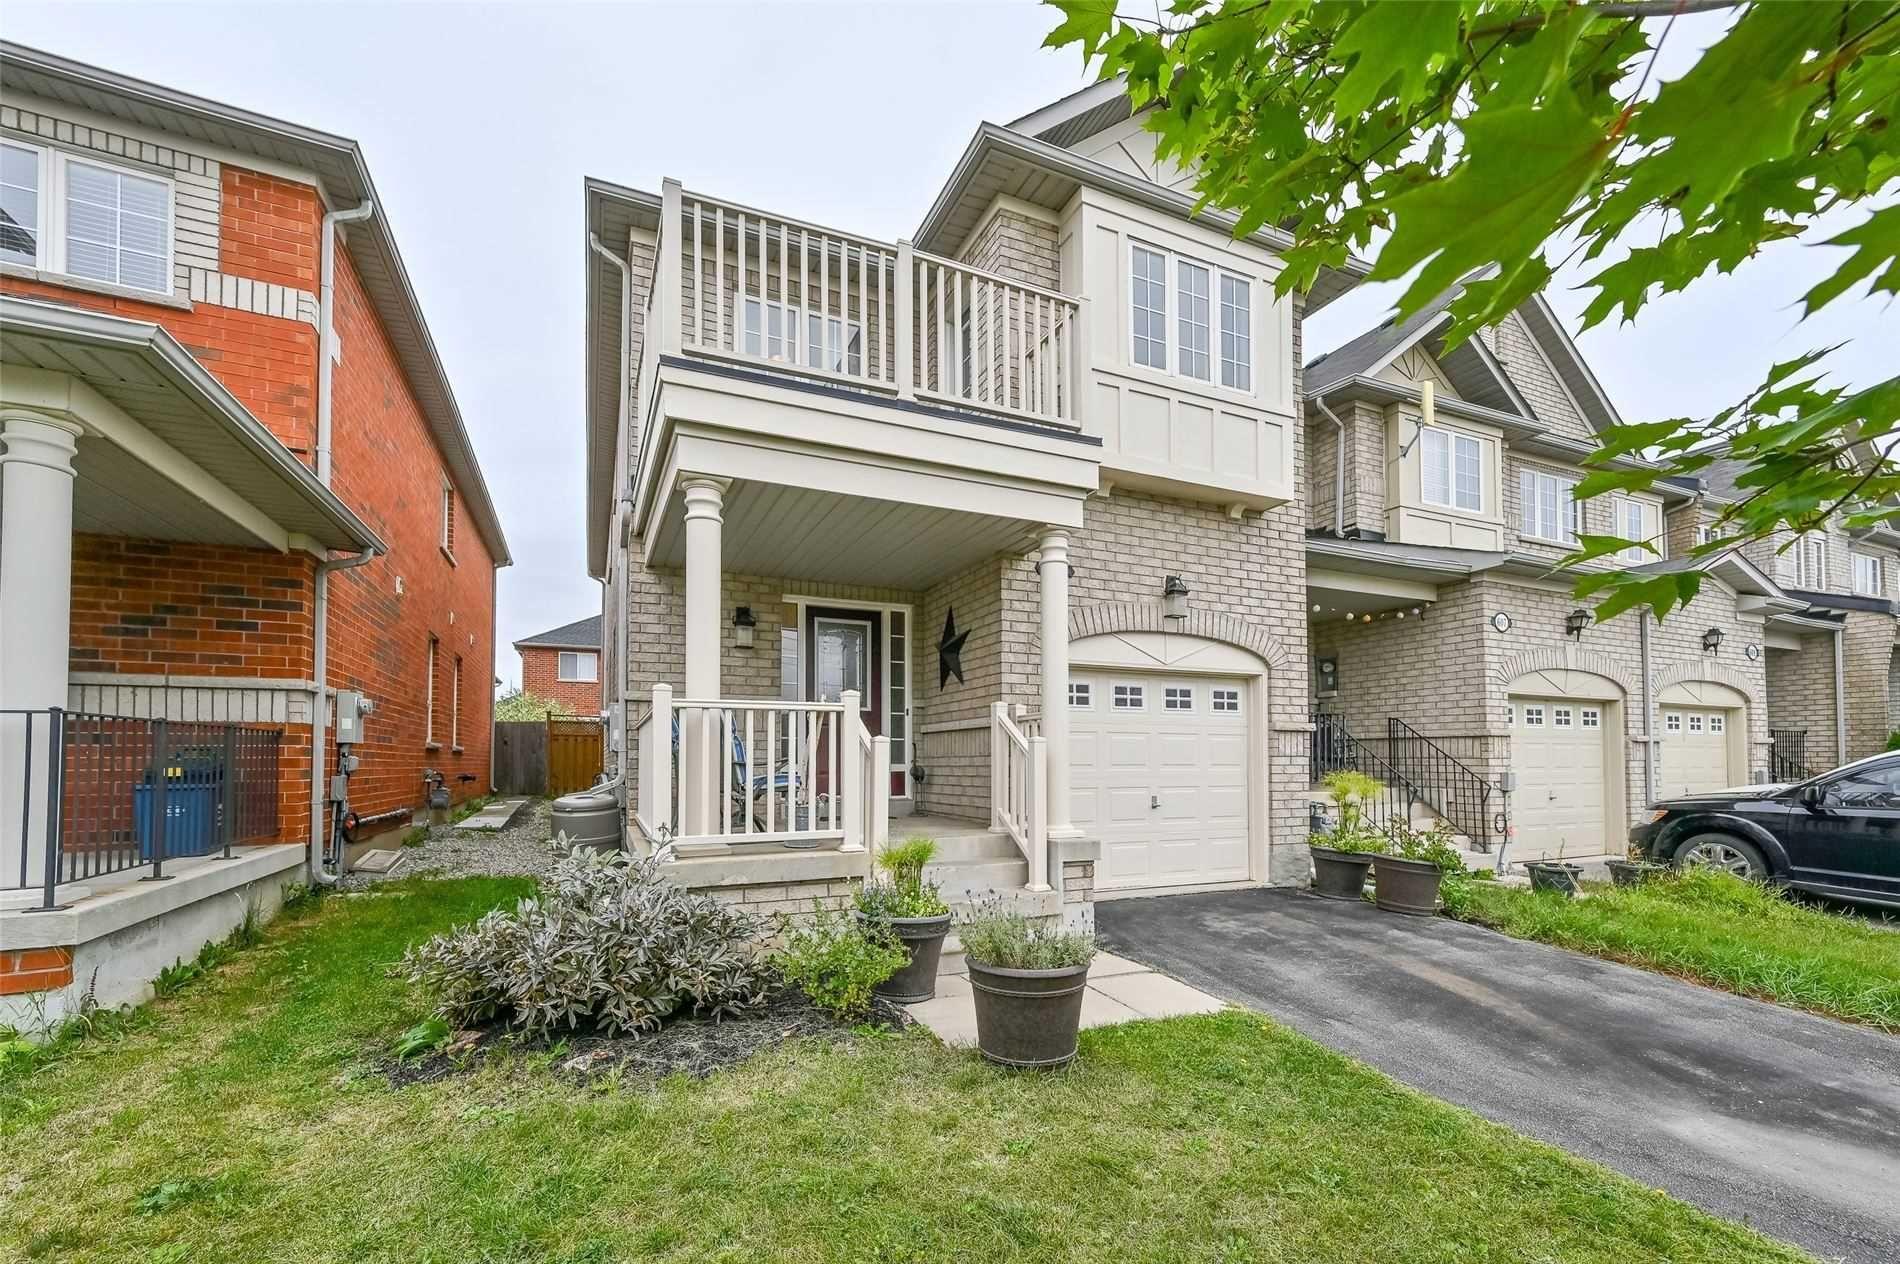 Main Photo: 605 Willmott Crescent in Milton: Clarke House (2-Storey) for sale : MLS®# W4578121